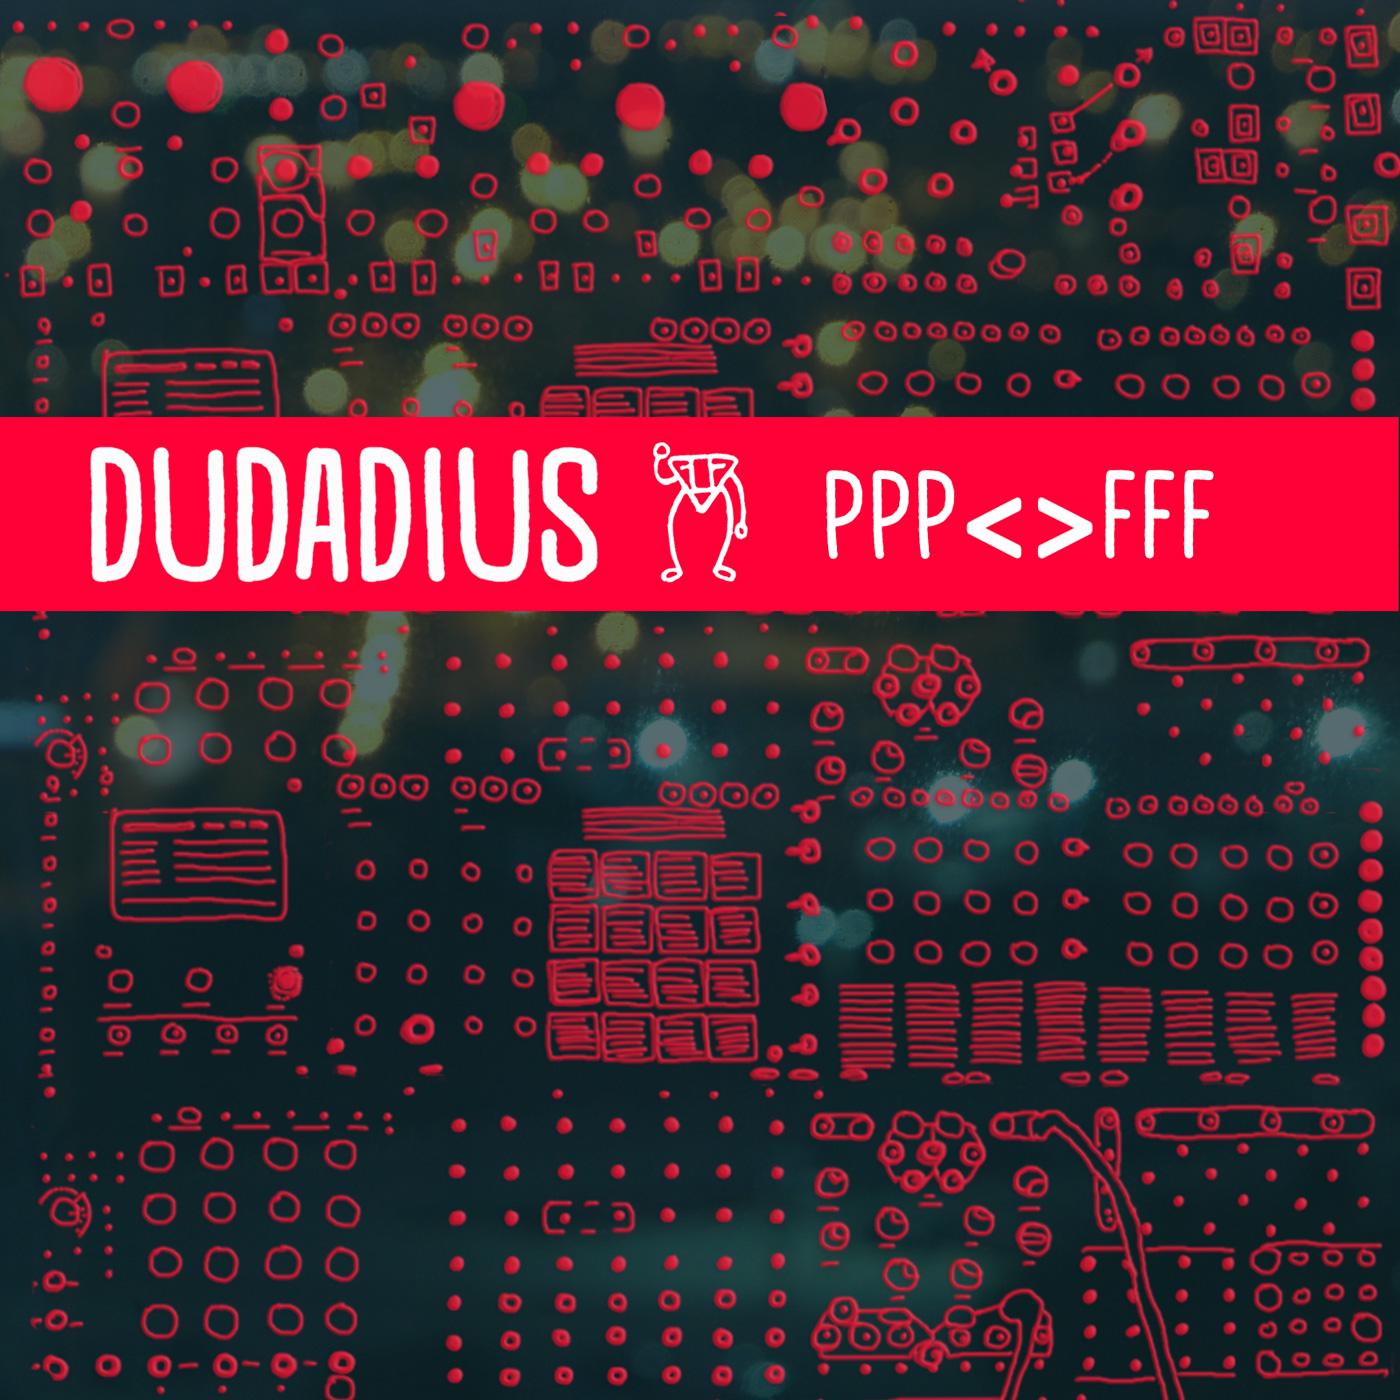 dudadius ppp<>FFF 1400.jpg